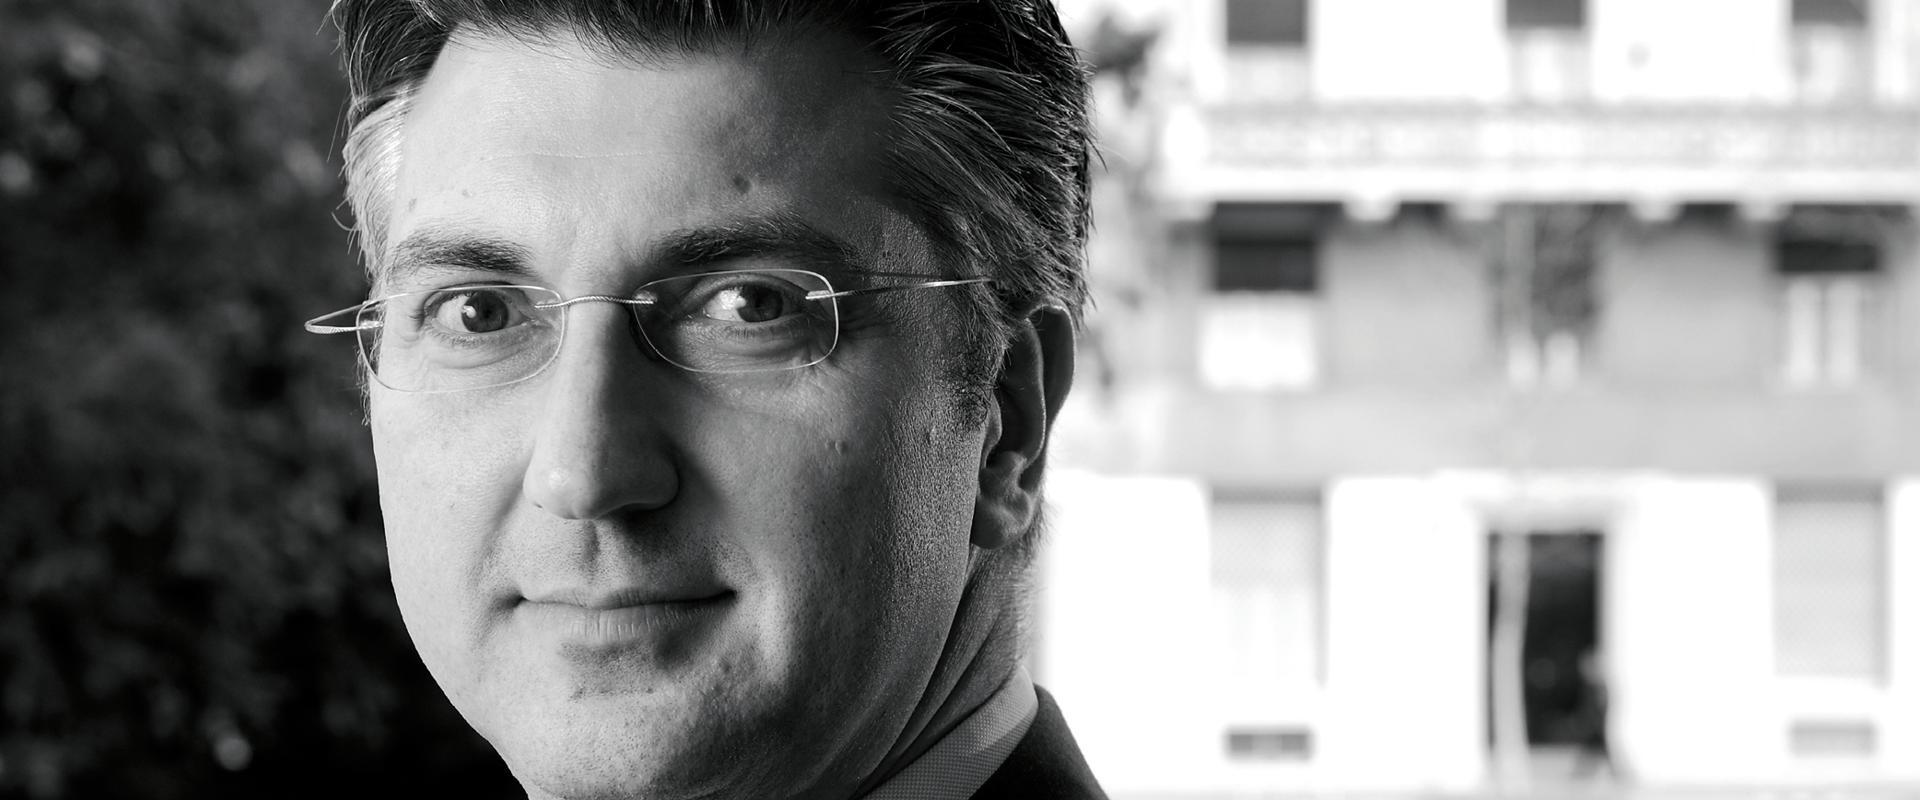 Kako se kroji plan za dovođenje Plenkovića na čelo HDZ-a